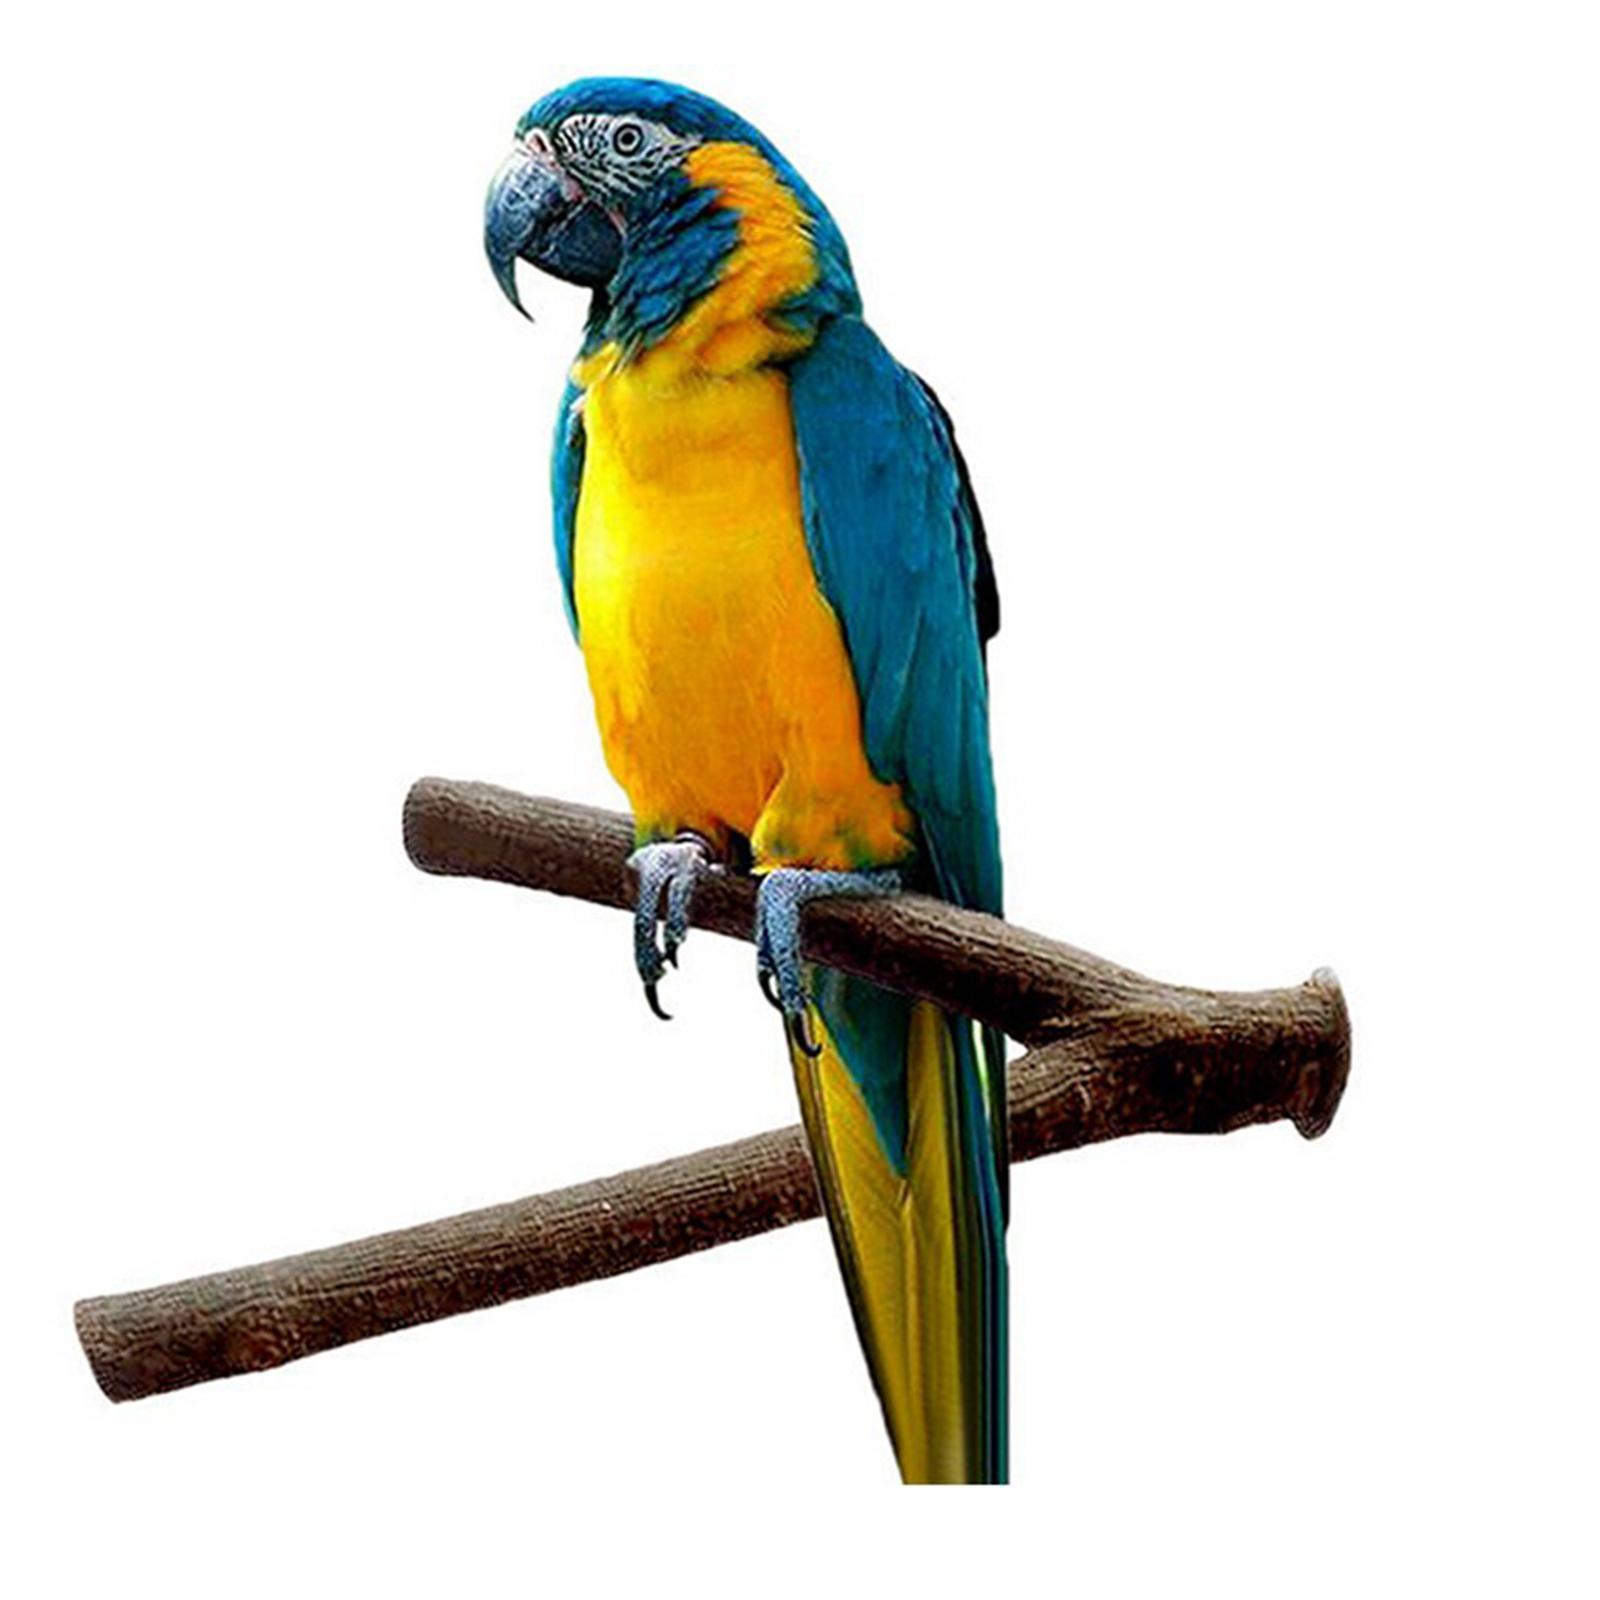 thumbnail 27 - Bird-Perch-Wood-Stand-Bird-Cage-Swing-Branch-for-Parrot-Parakeet-Cockatiel